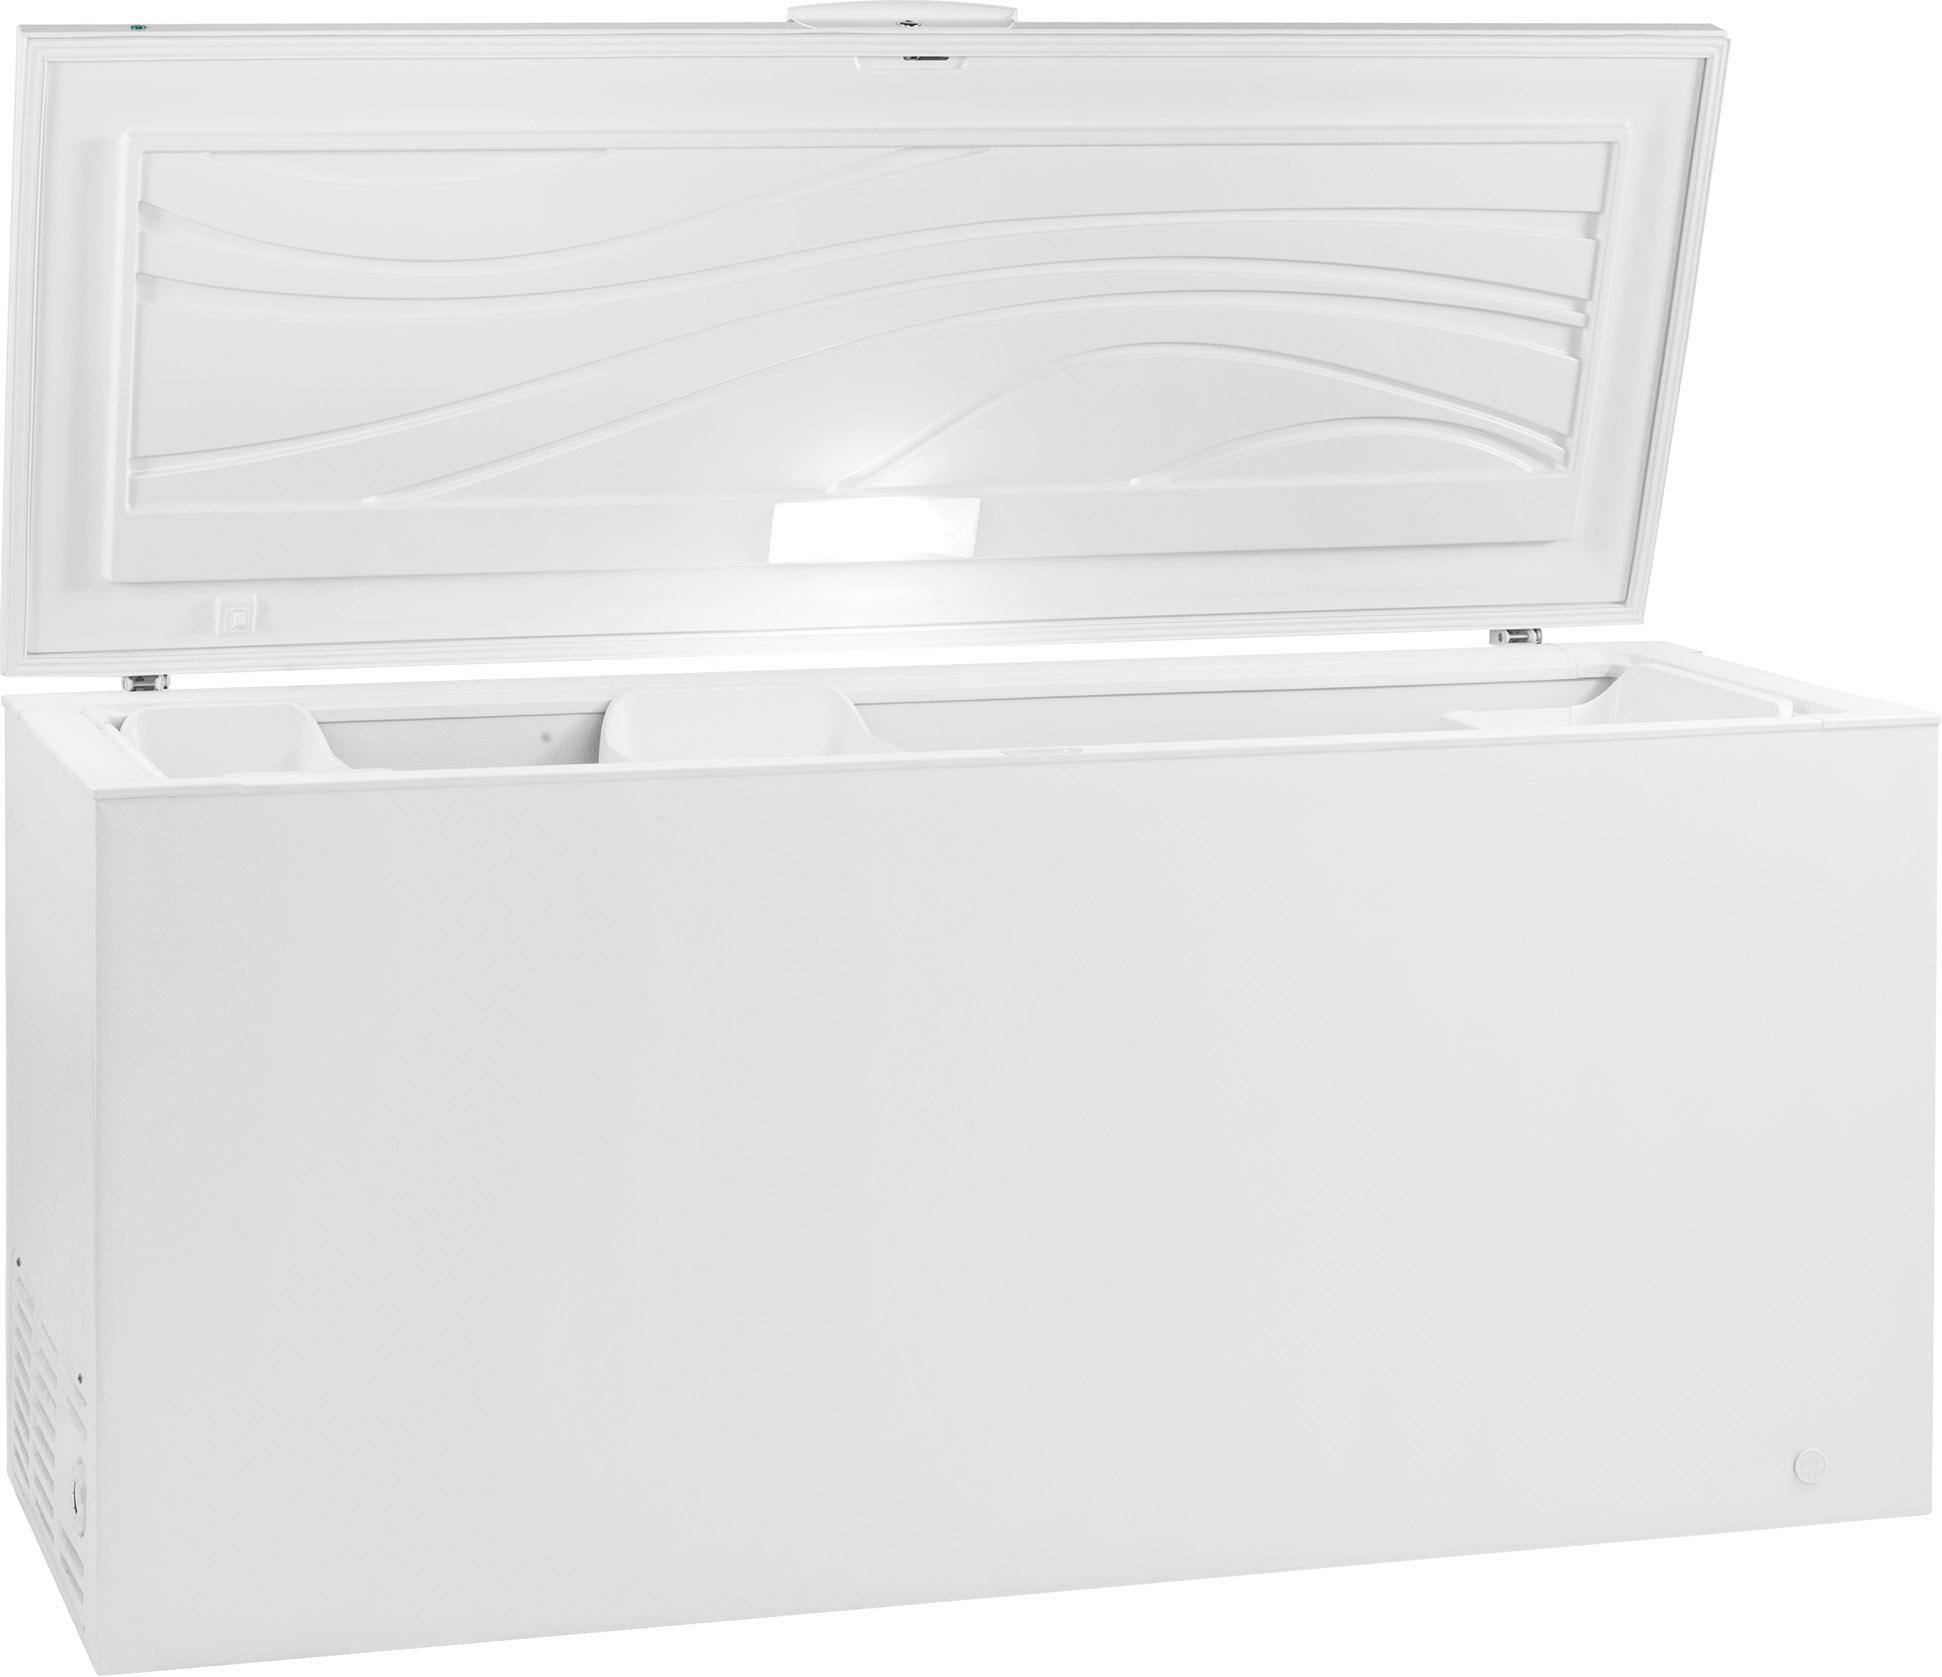 Frigidaire FFFC18M6QW 17.5 cu. ft Chest Freezer - White